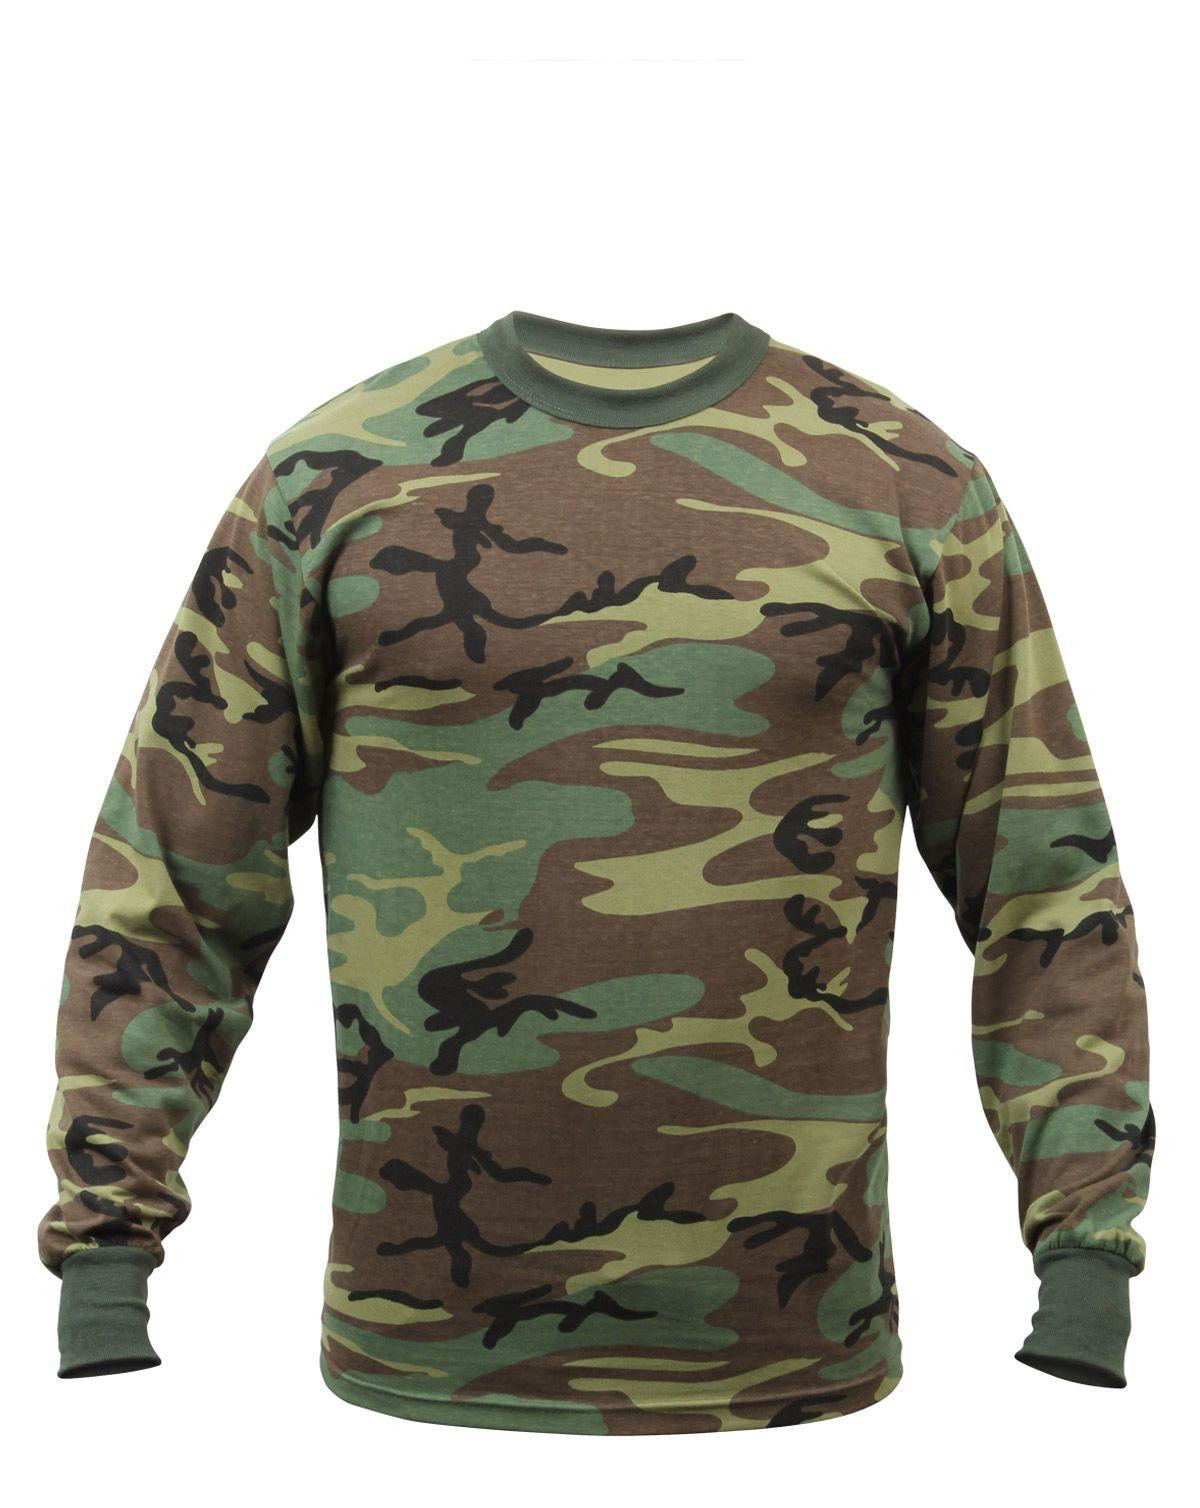 rothco langærmet t-shirt - drenge (woodland, 122-128 / s) fra rothco